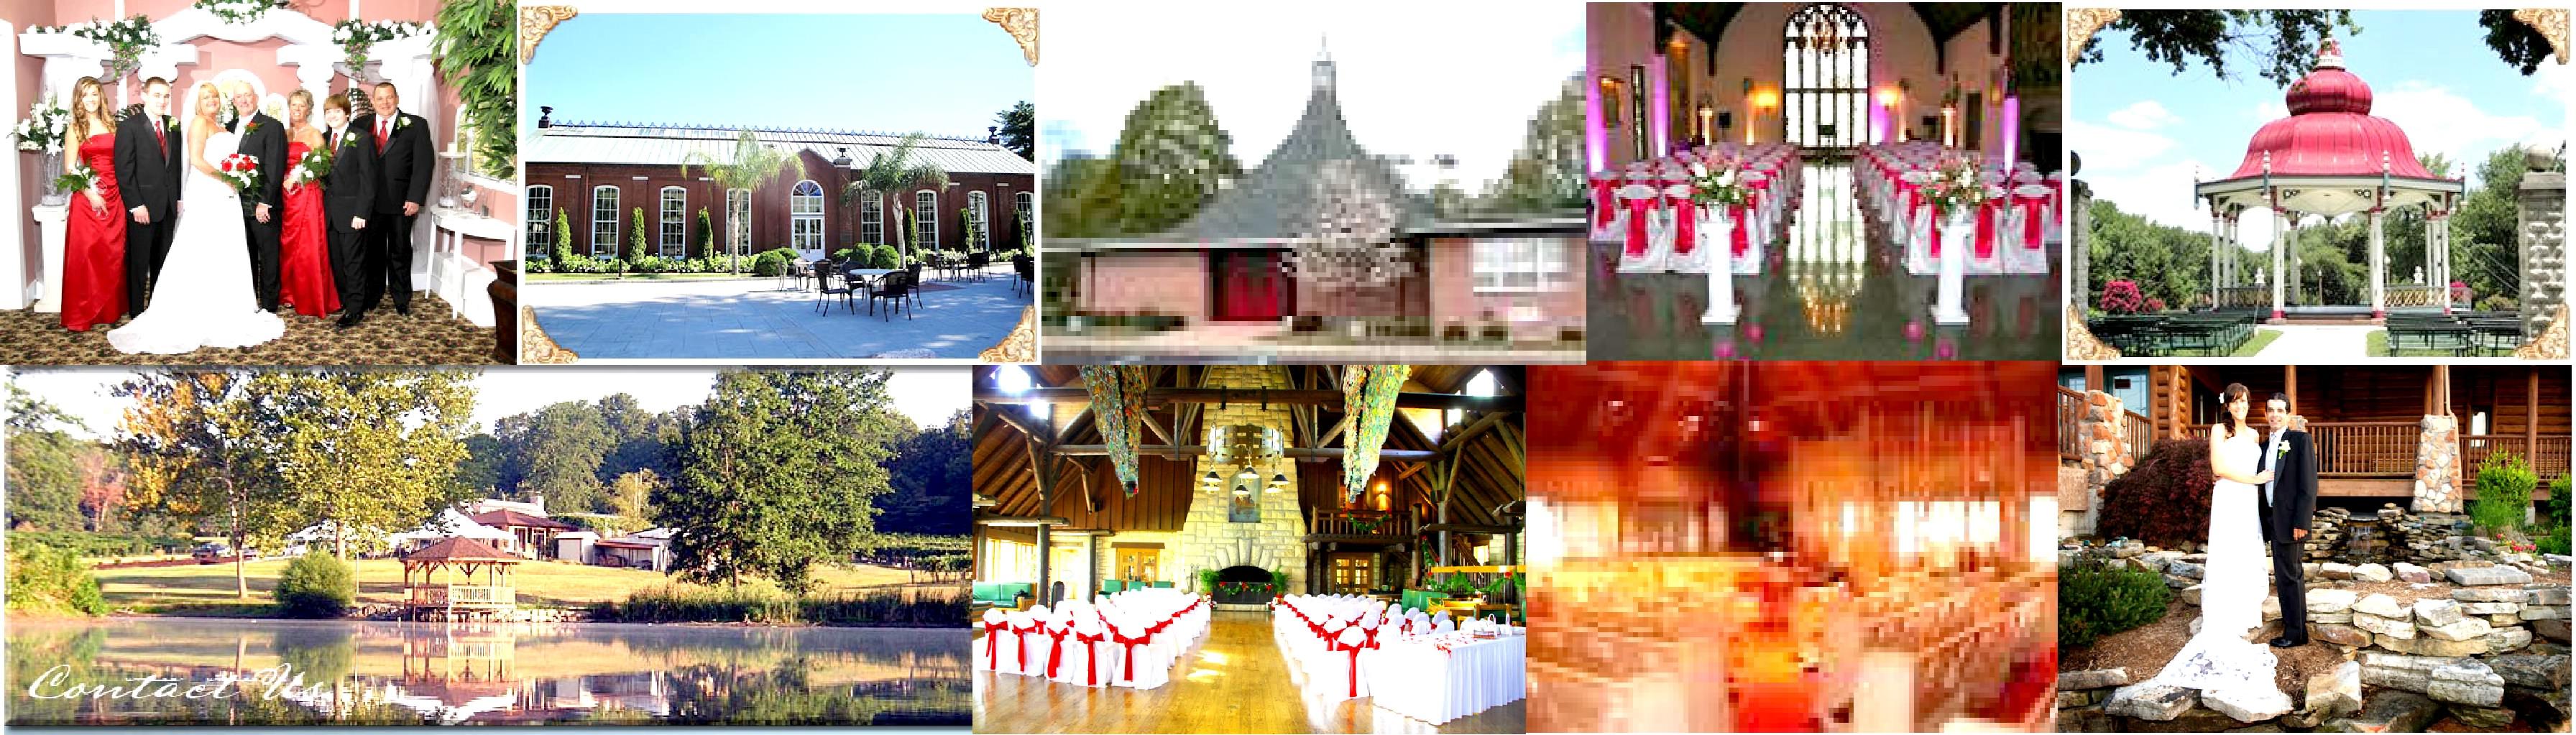 St louis wedding venues ceremony sites st louis weddingst louis st louis wedding venues junglespirit Gallery